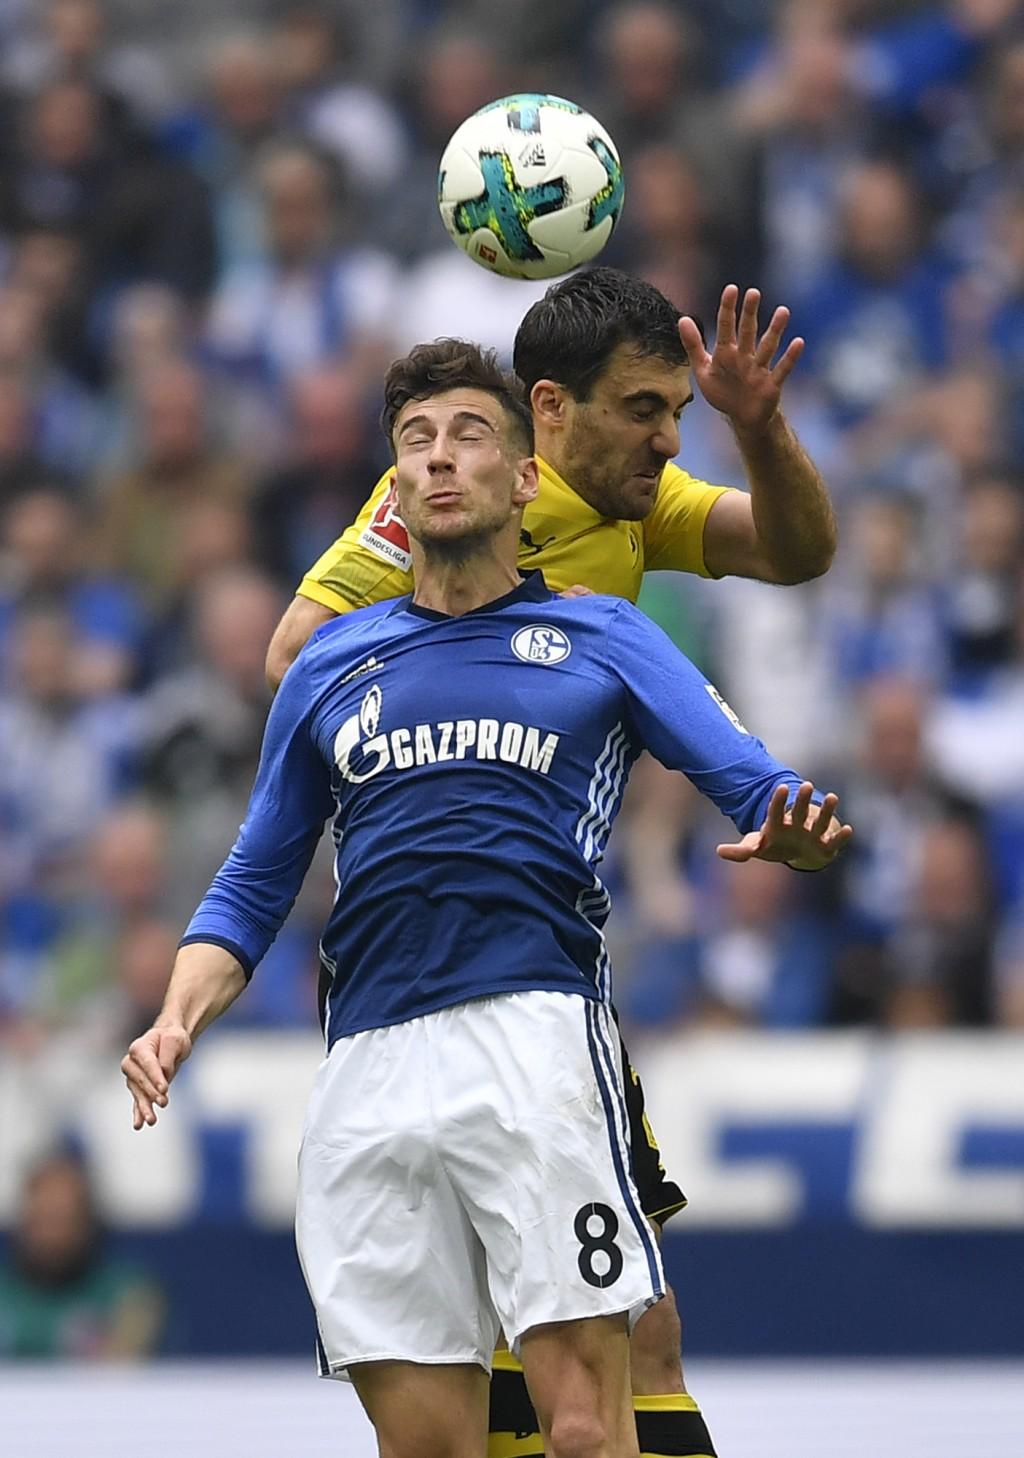 Schalke's Leon Goretzka and Dortmund's Sokratis challenge for the ball during the German Bundesliga soccer match between FC Schalke 04 and Borussia Do